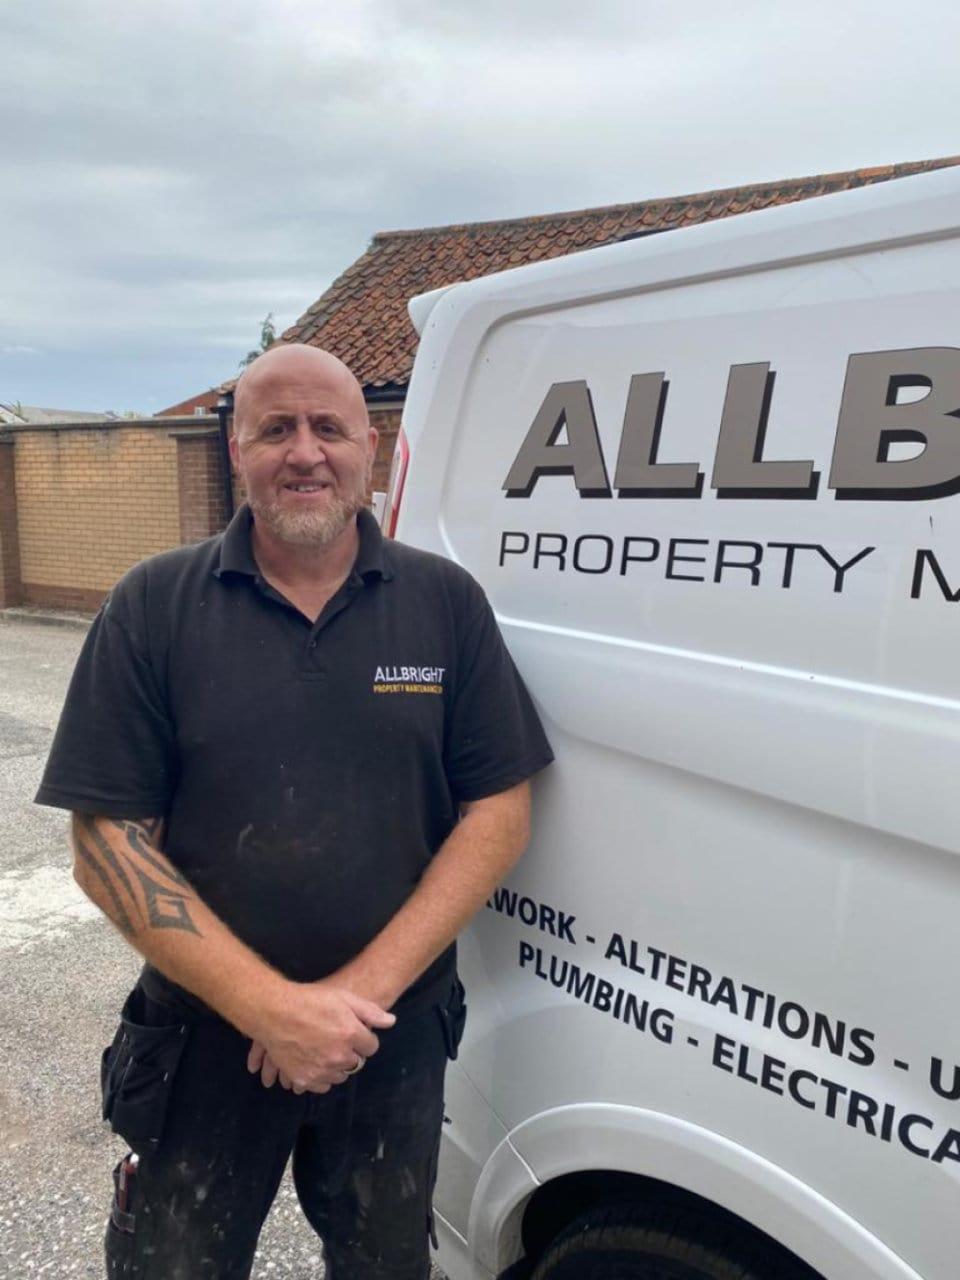 Screwfix Top Tradesperson 2020 Finalists allbright property maintenance peterborough adriano